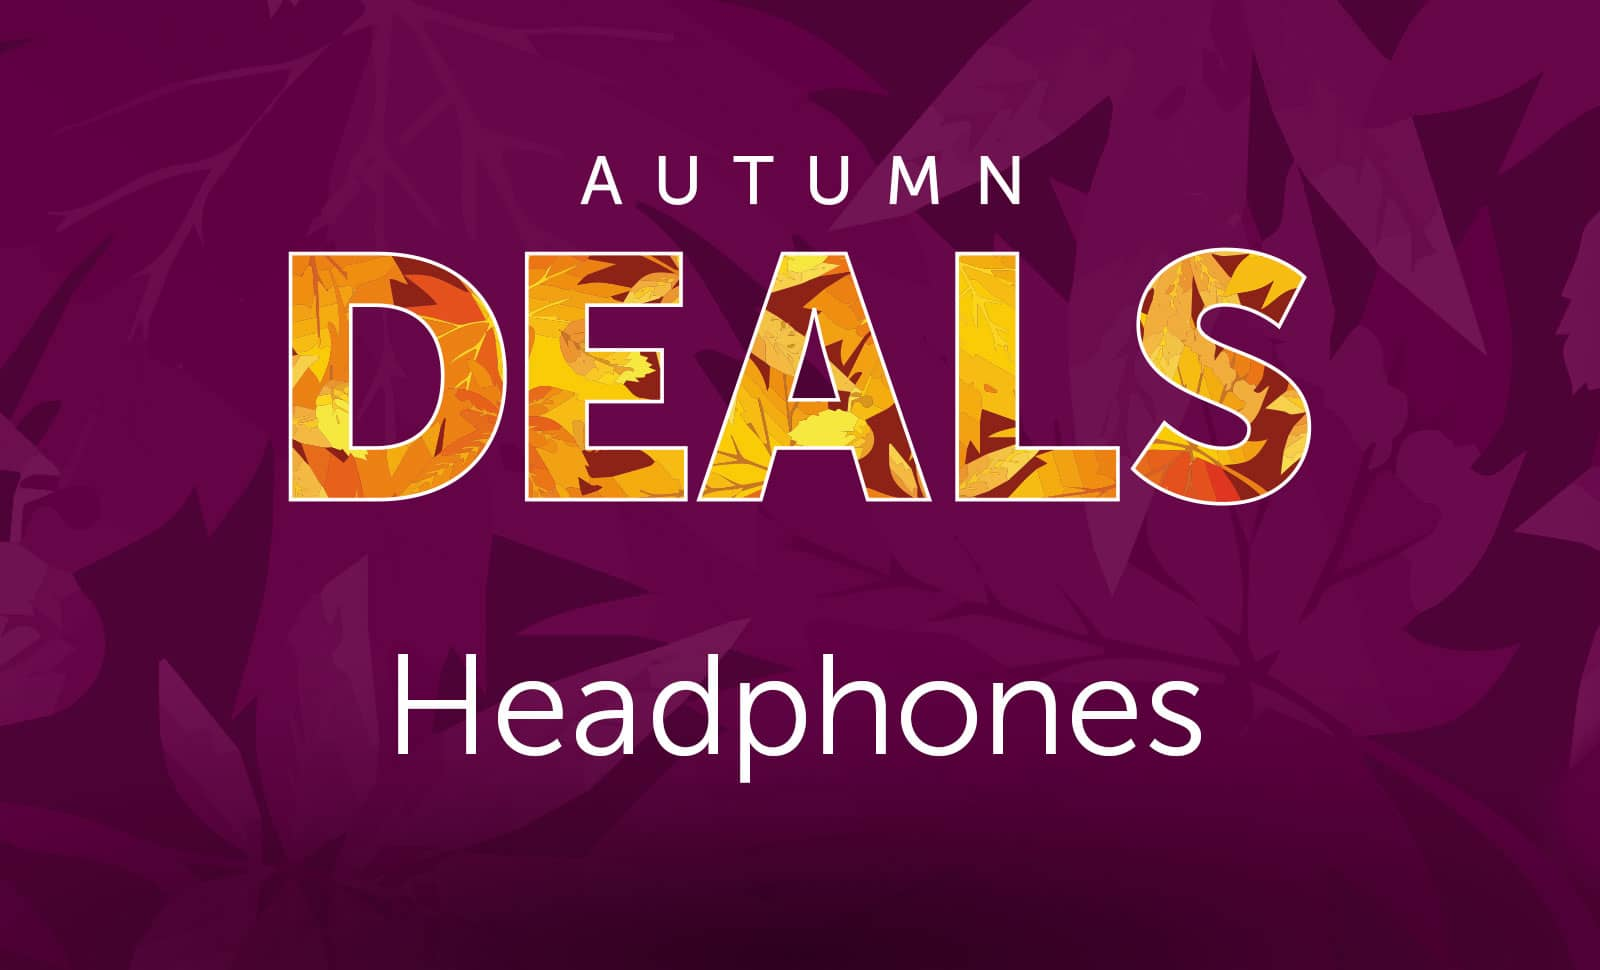 Autumn - Headphones